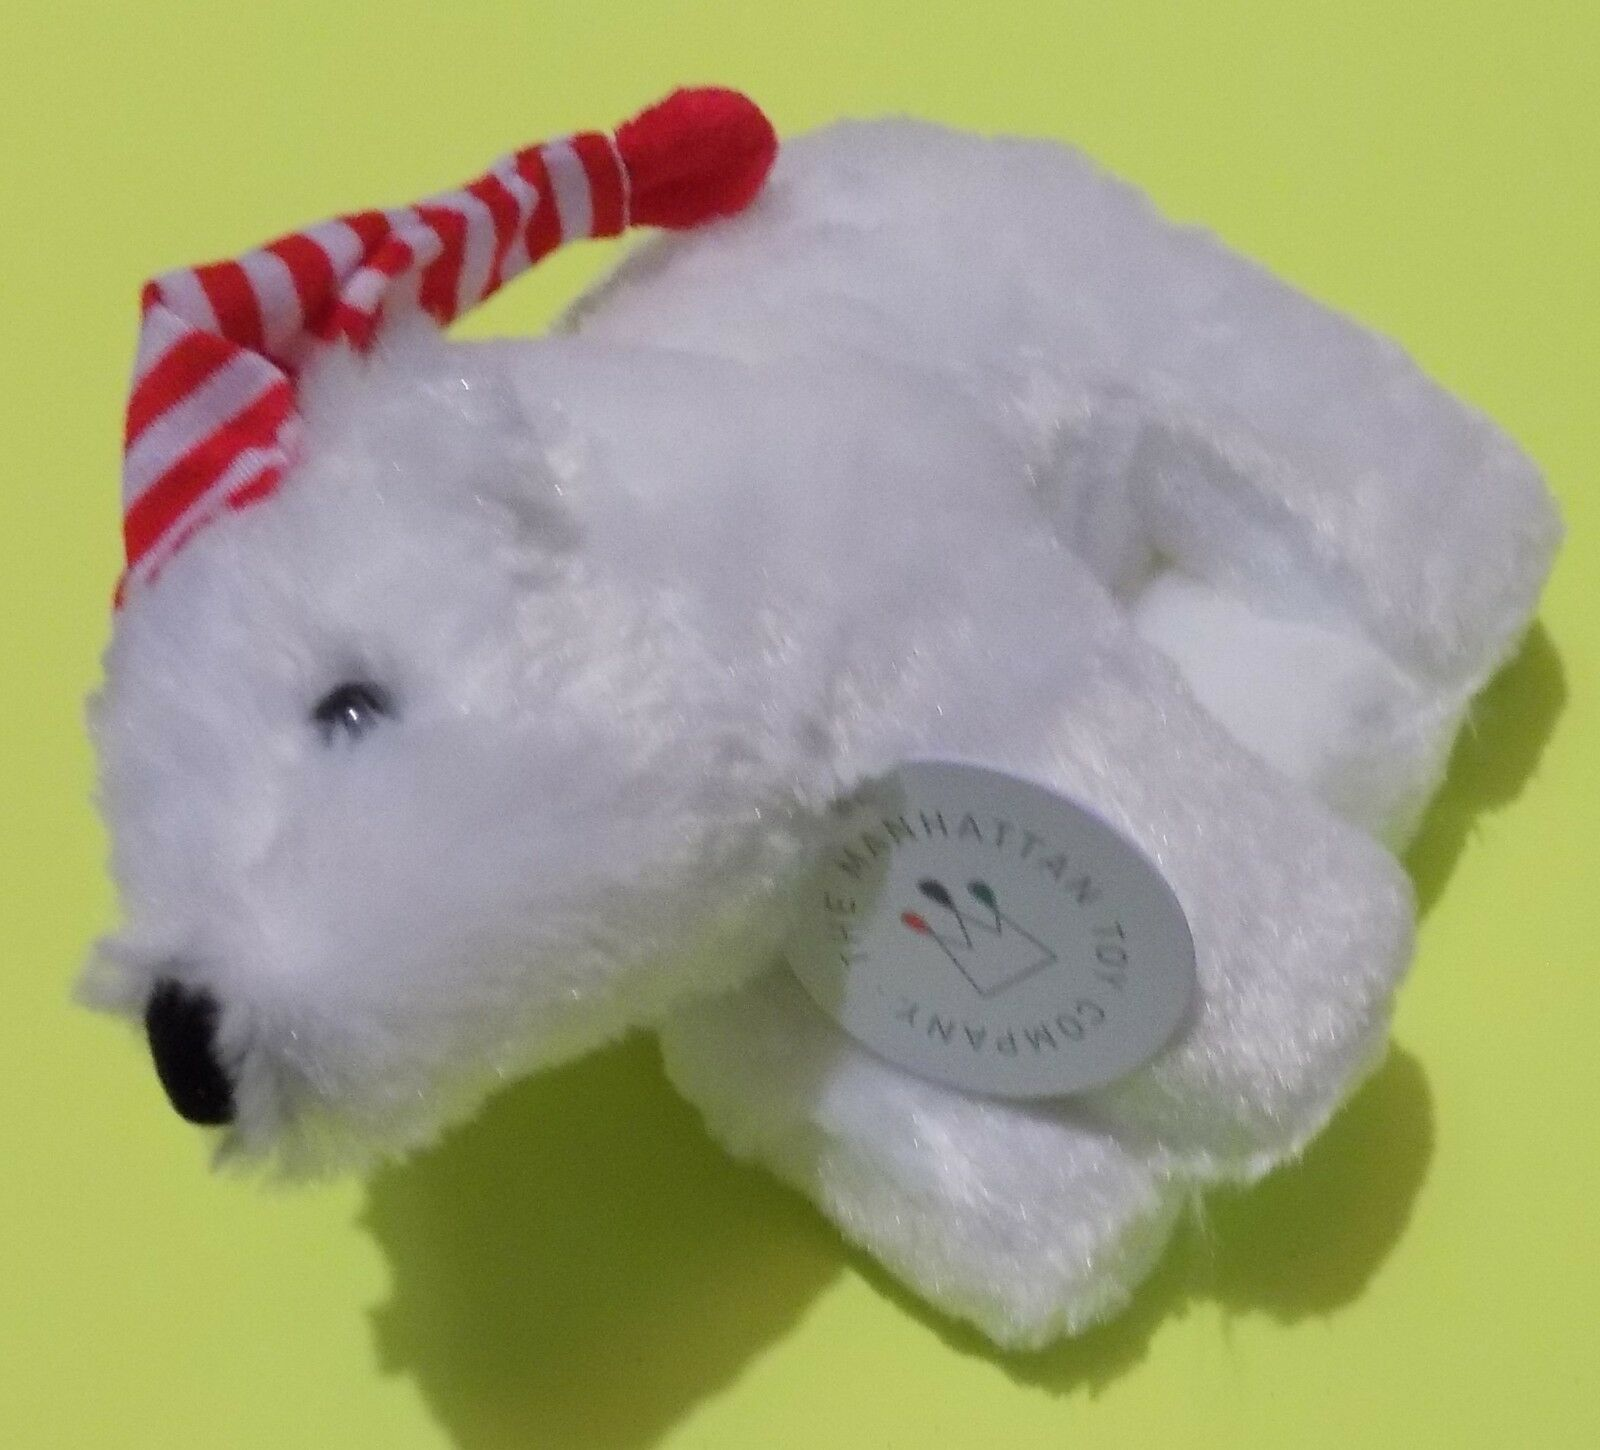 Manhattan Toy Holiday Voyagers White Polar Bear Stuffed Animal New